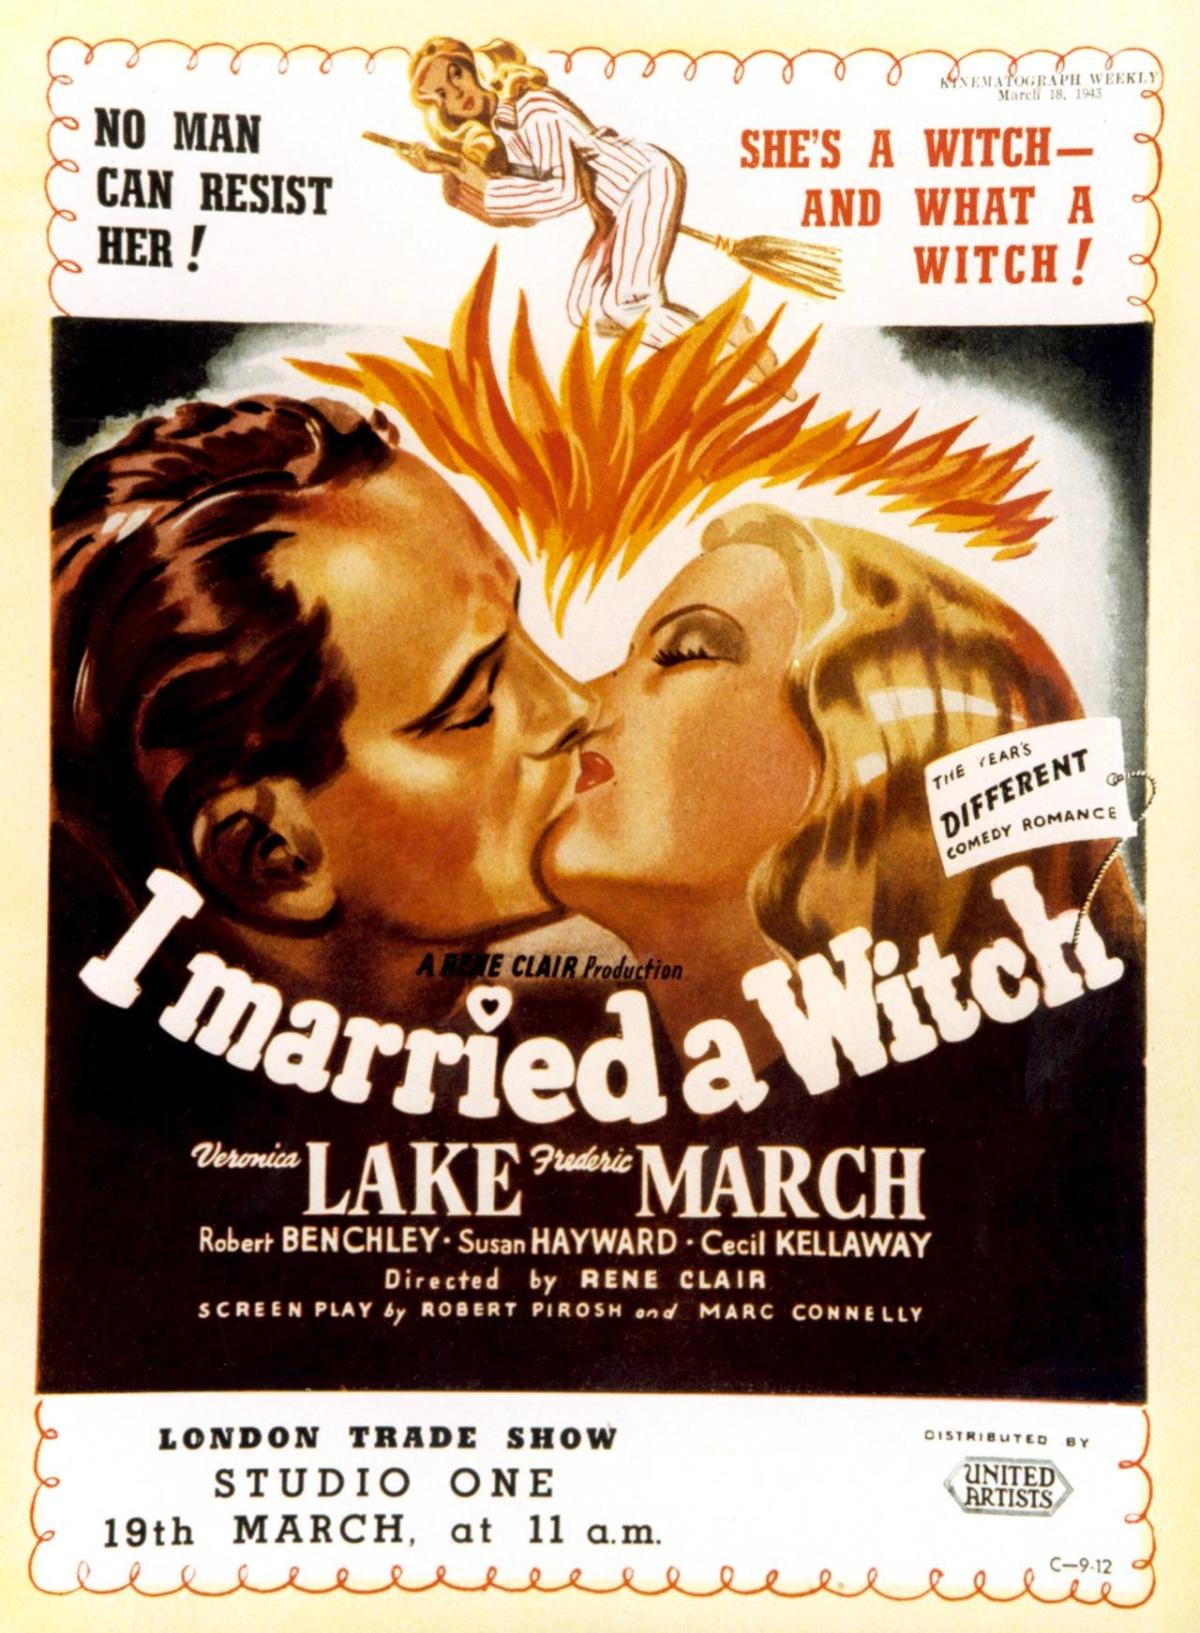 http://jesusangelortega.files.wordpress.com/2009/03/poster-i-married-a-witch_02.jpg?w=1200